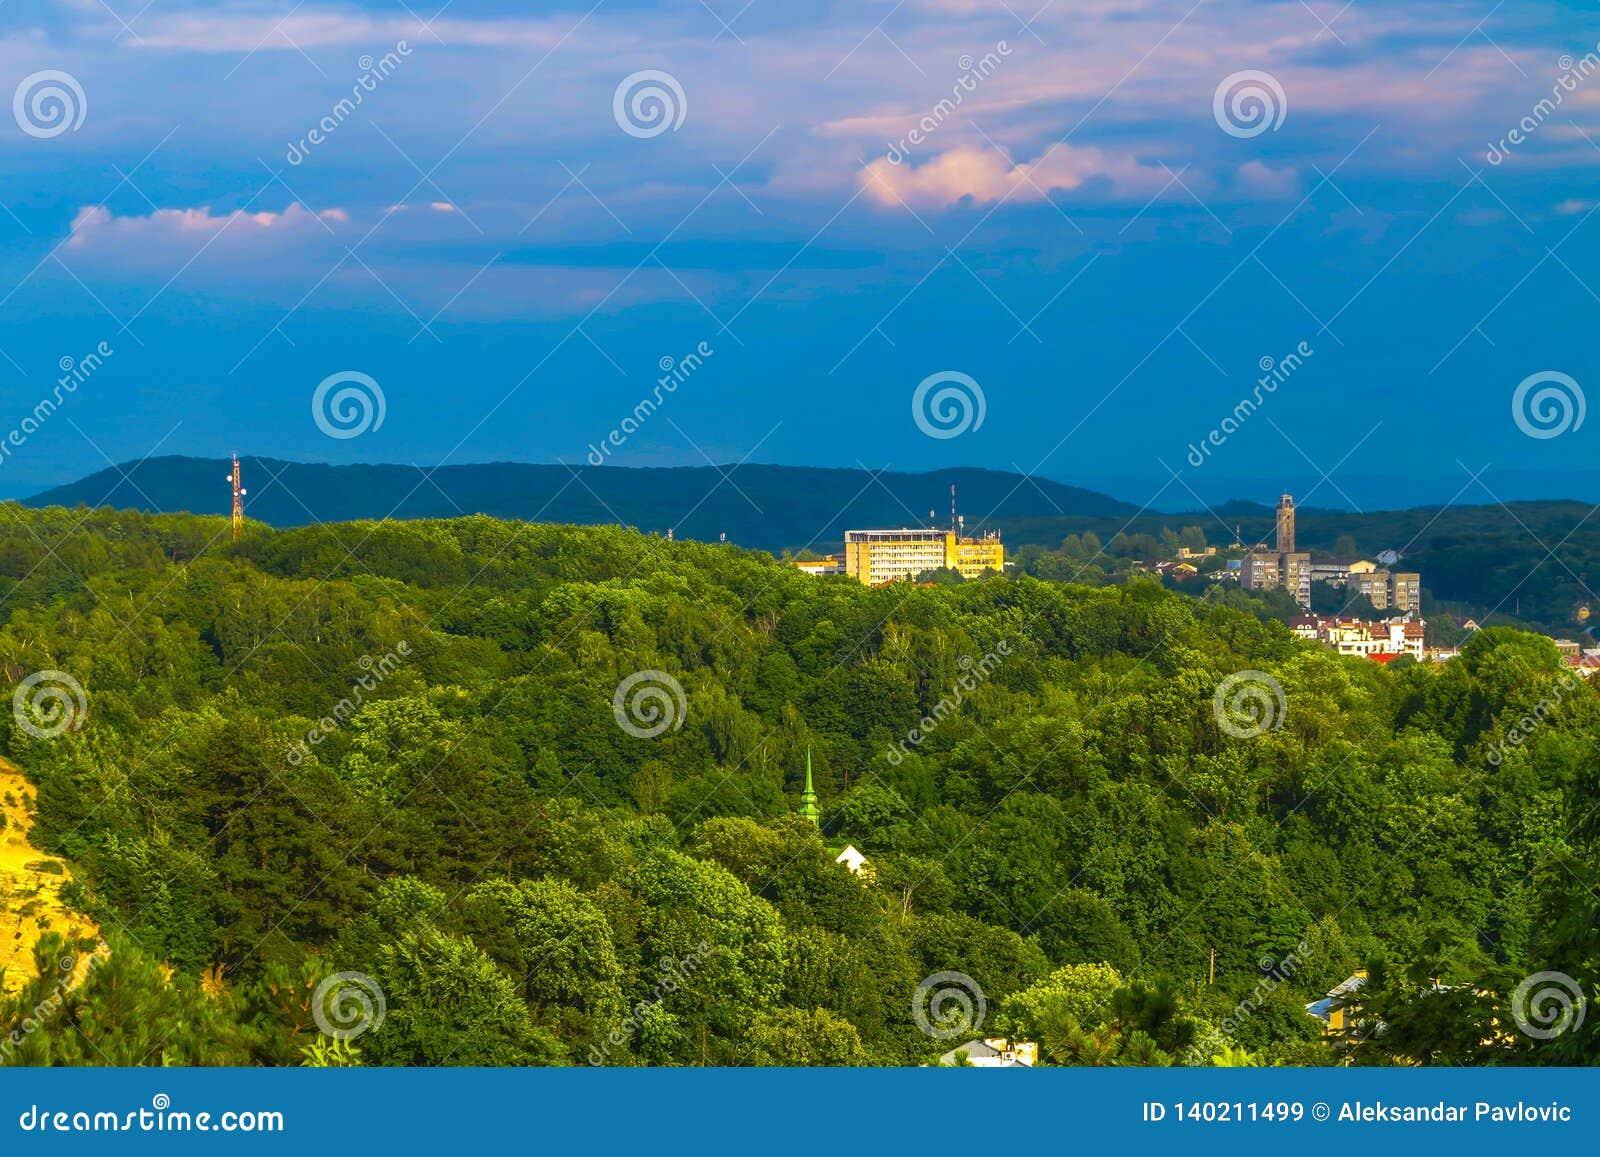 Lviv Cityscapesynvinkel 05